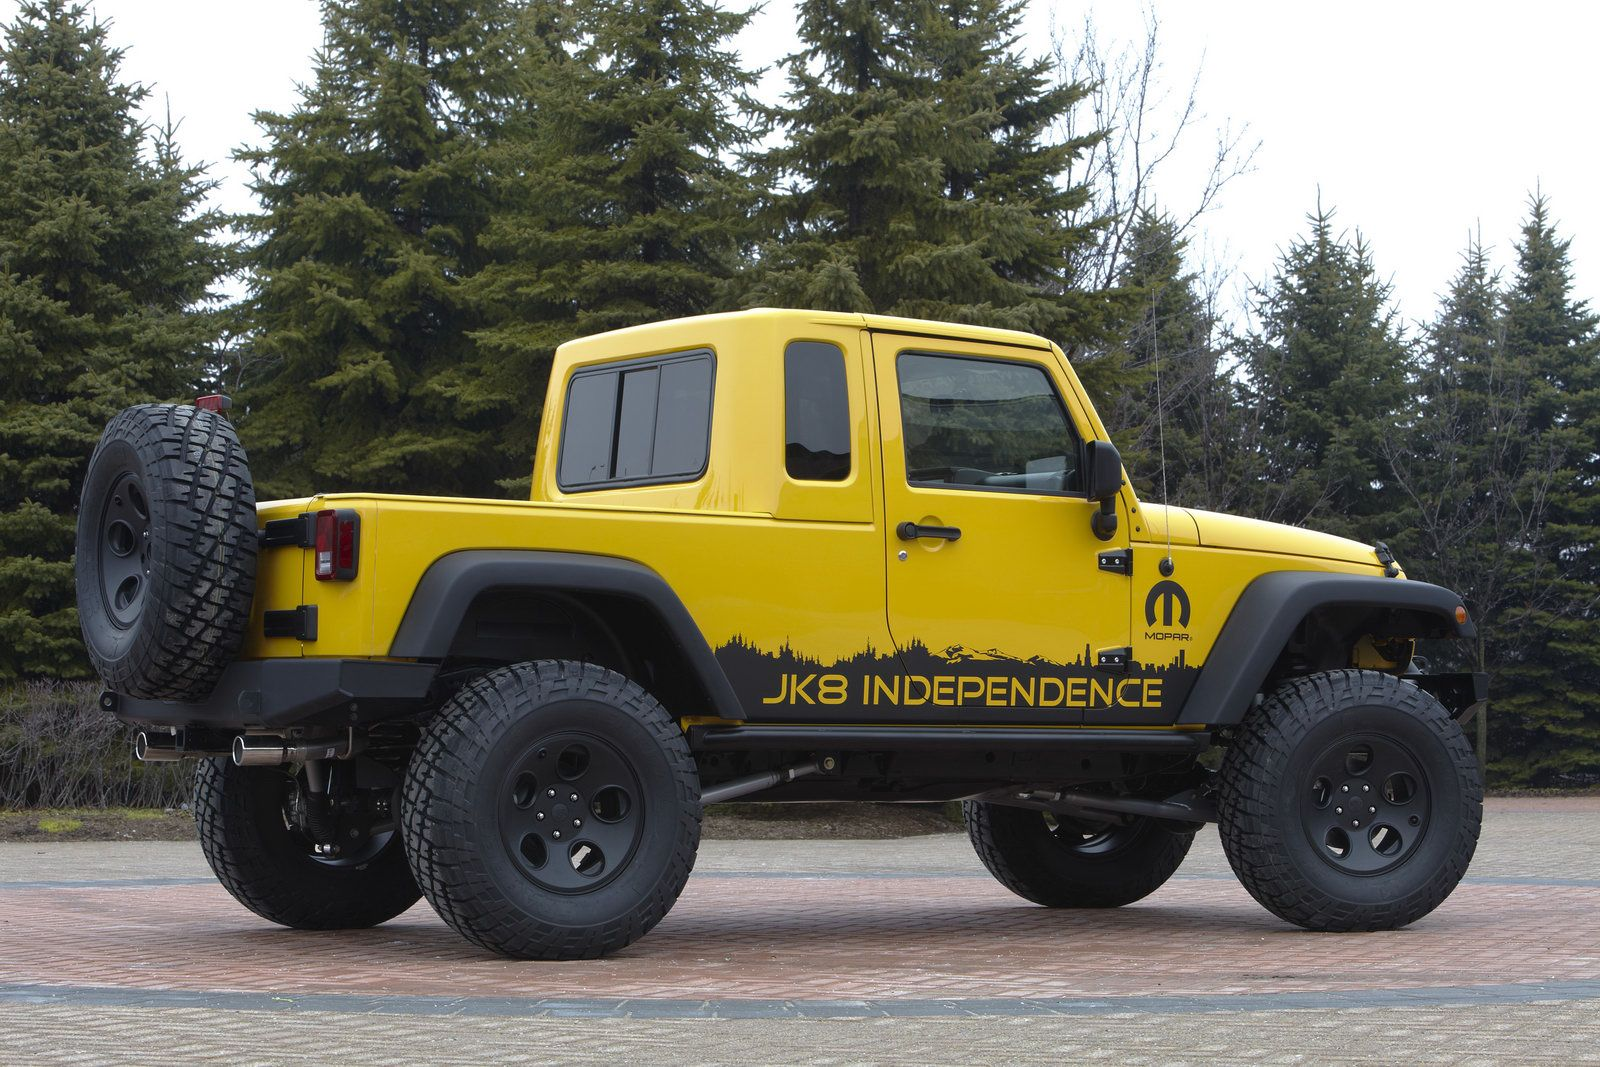 Jeep Wrangler Jk 8 Independence Diy Mopar Kit Allows Owners To